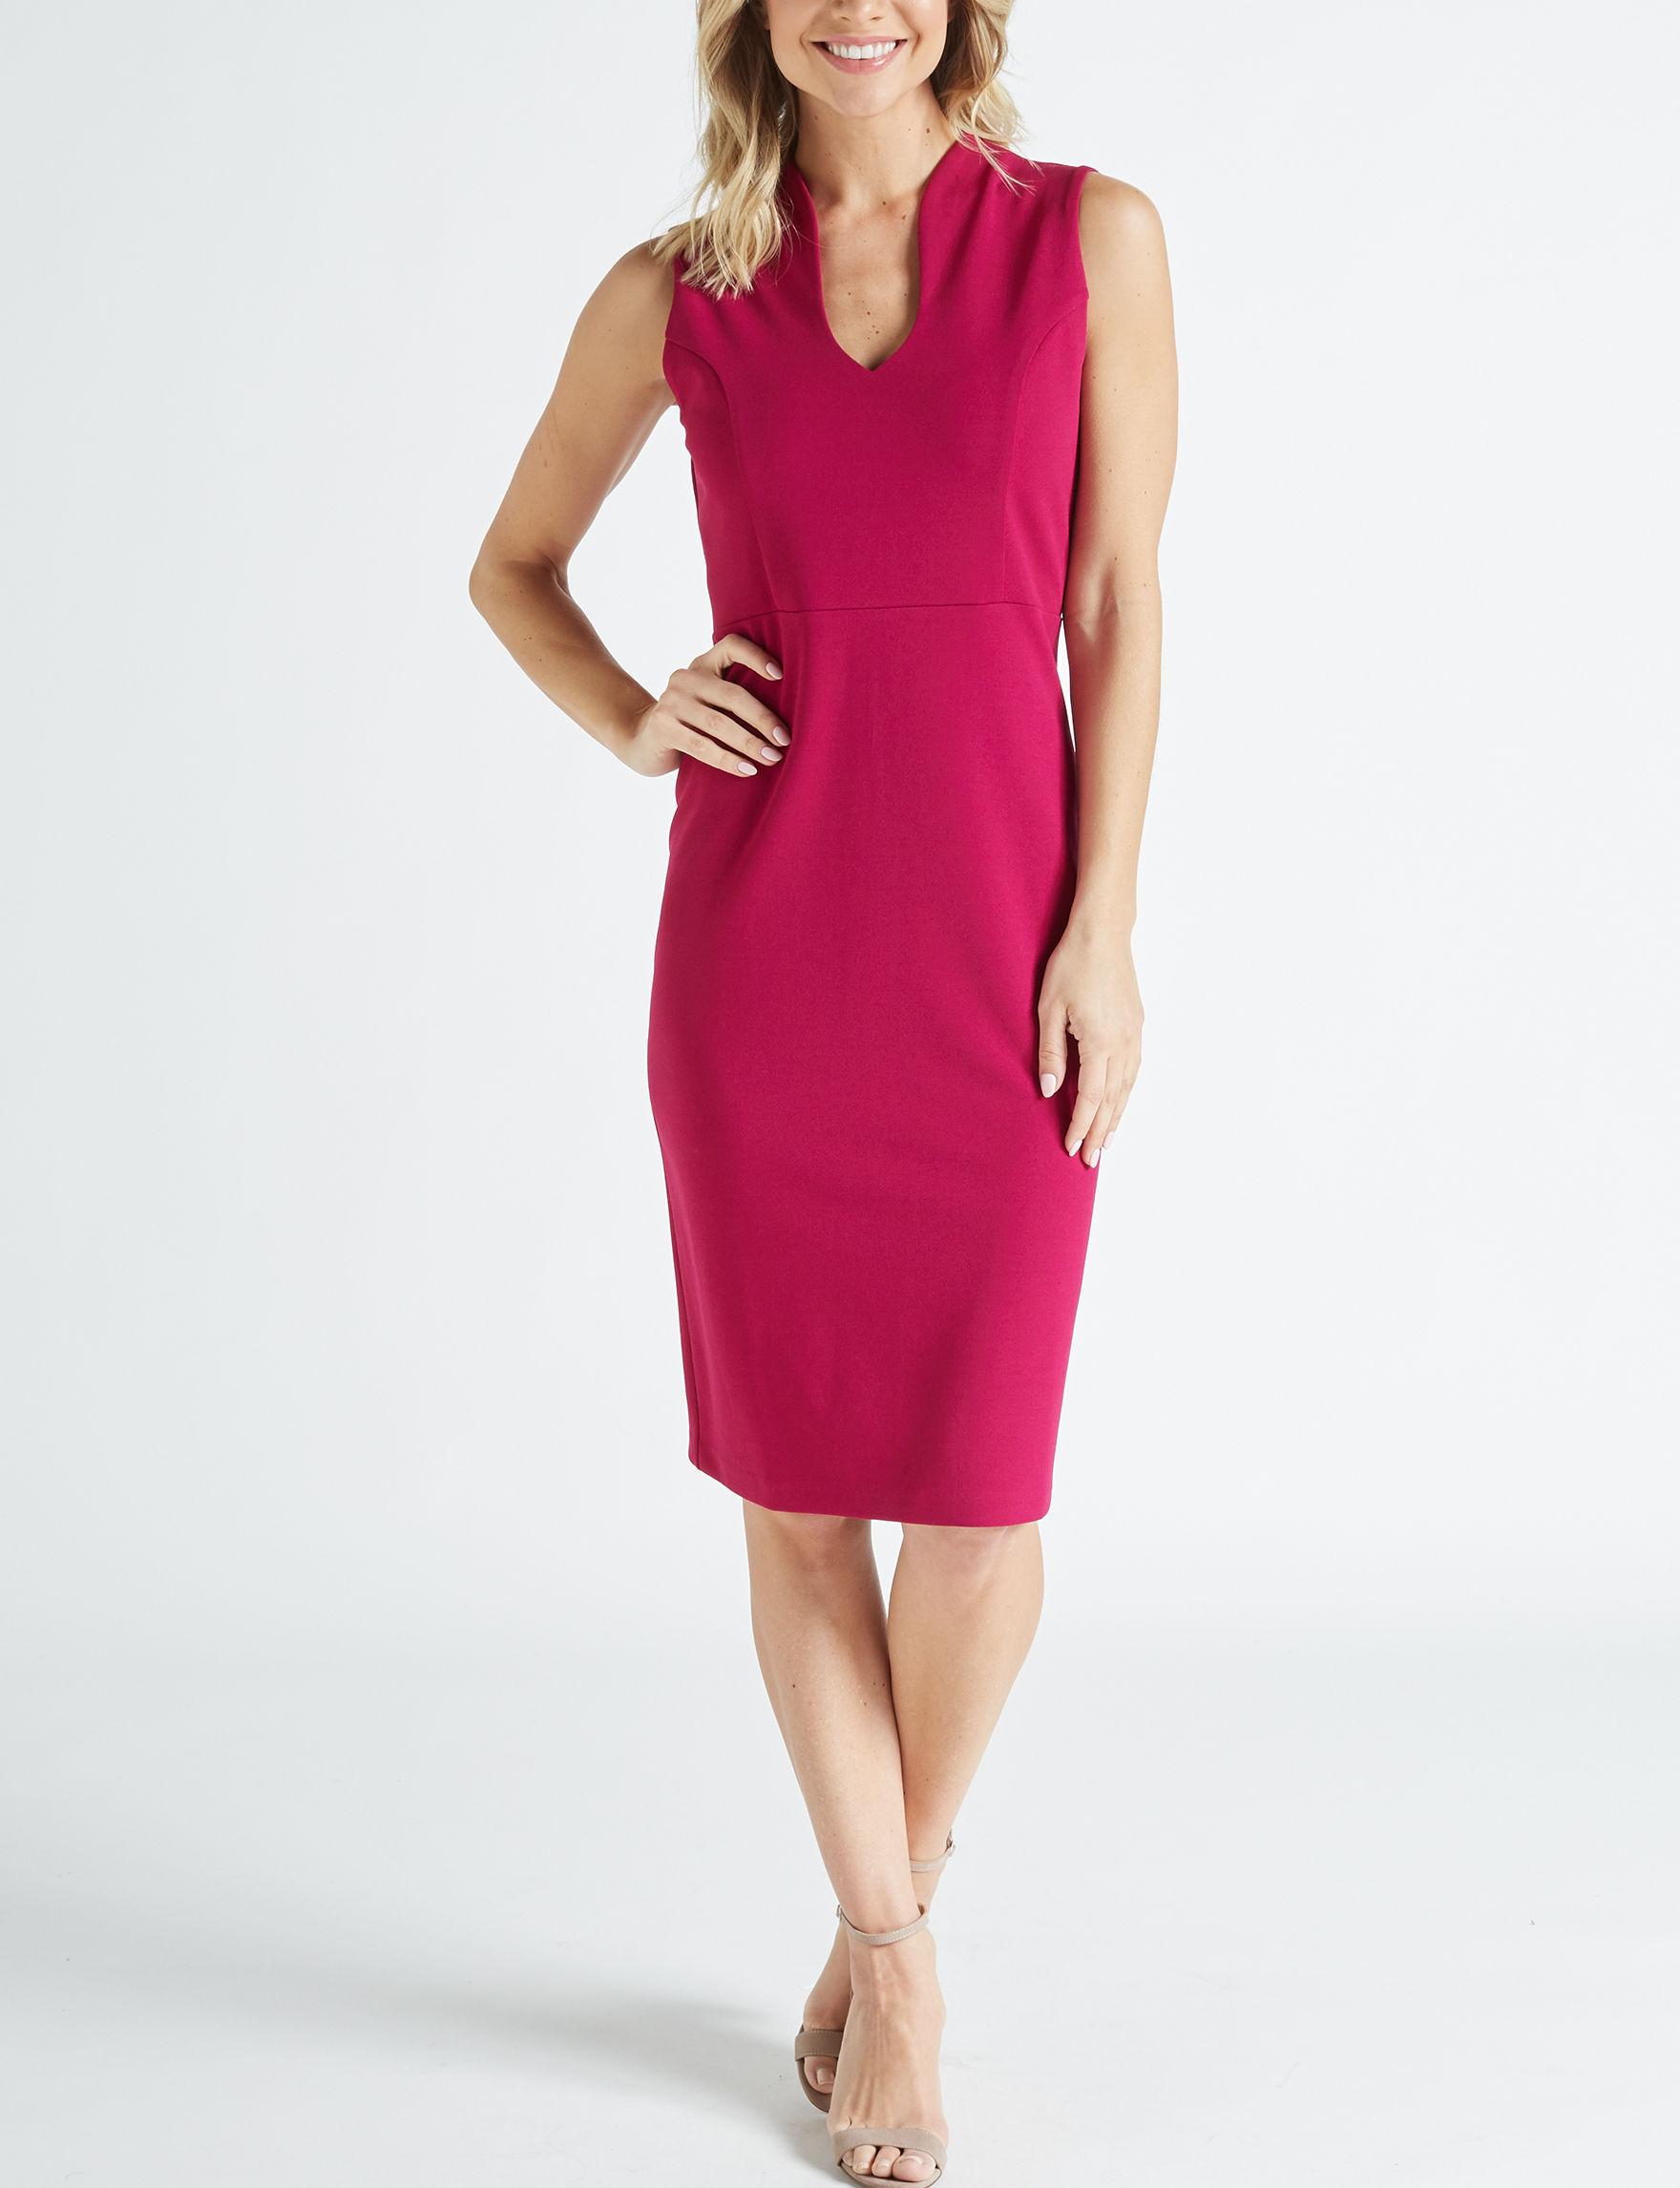 Nina Leonard Red Everyday & Casual Sheath Dresses